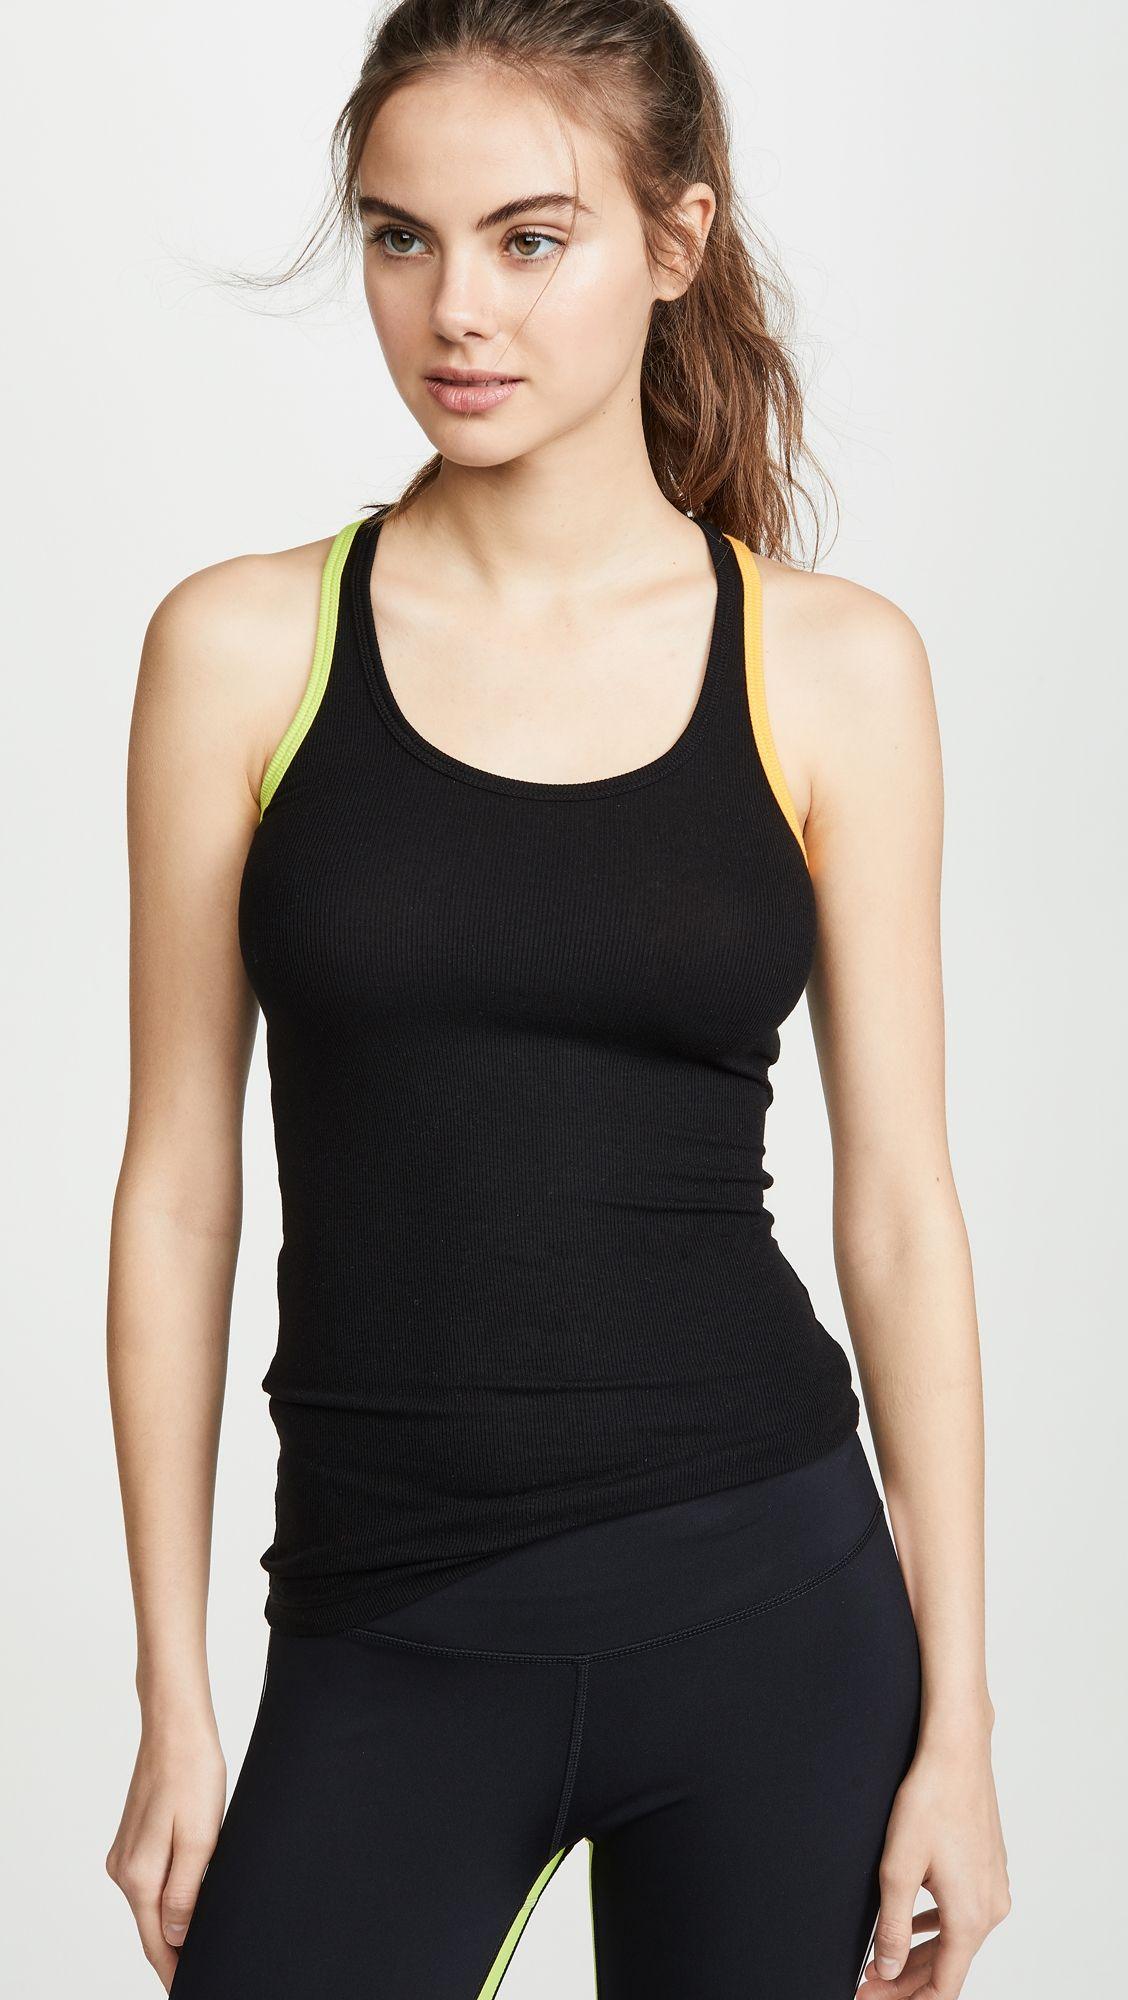 Ashby Tank Women, Long tops, Athletic tank tops